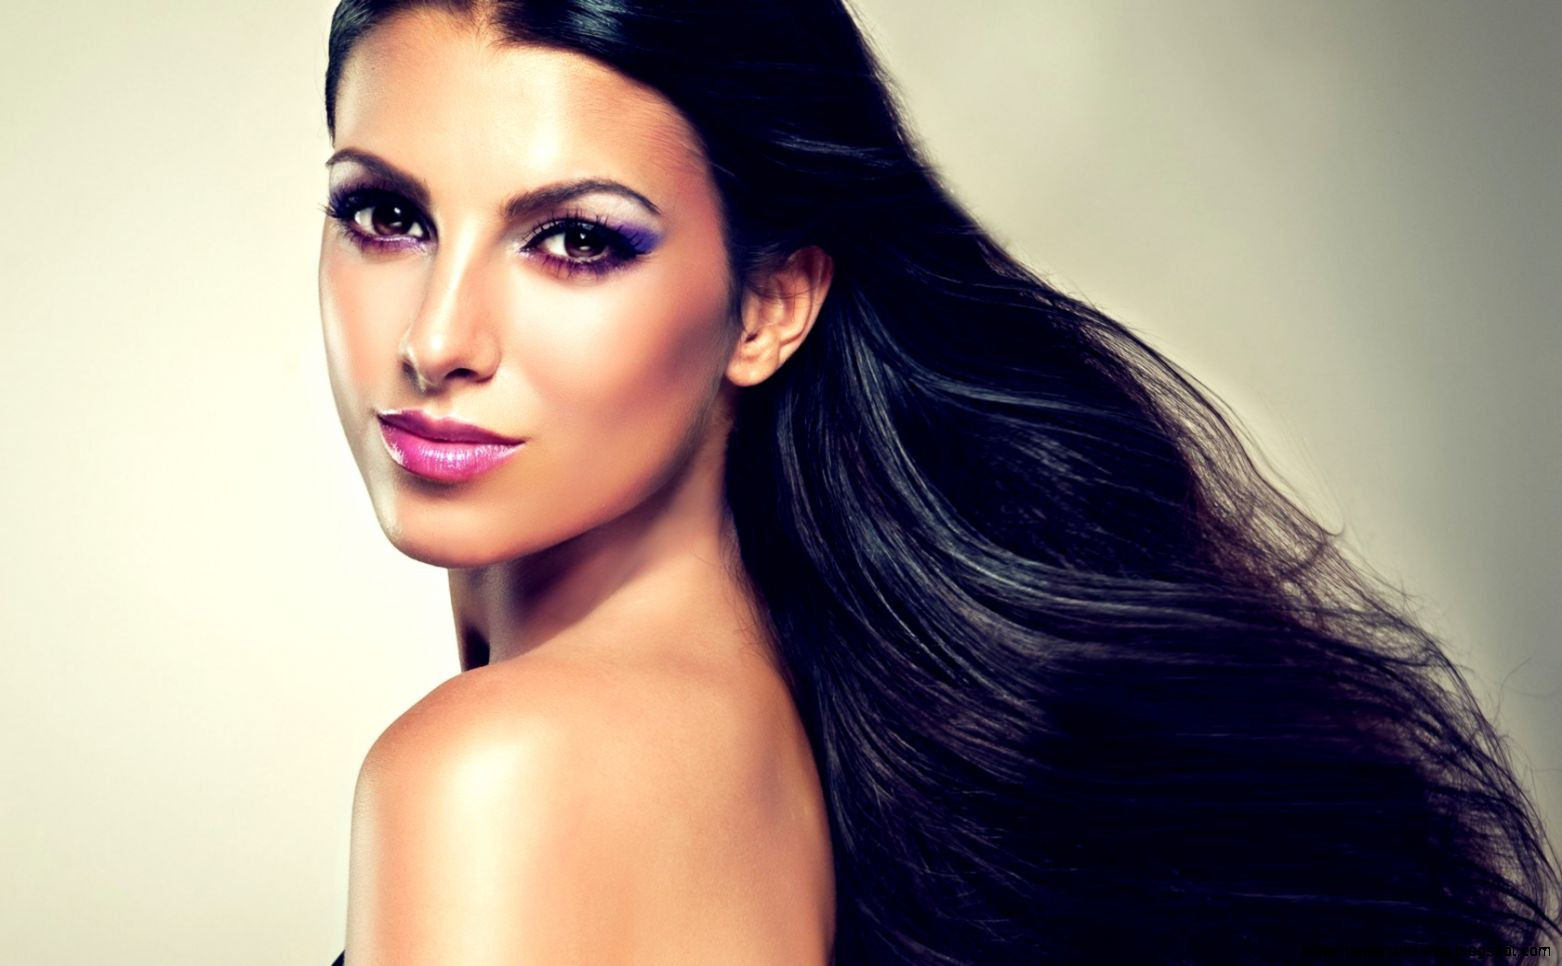 Brunette Style Makeup HD Wallpaper   FreeWallsUp